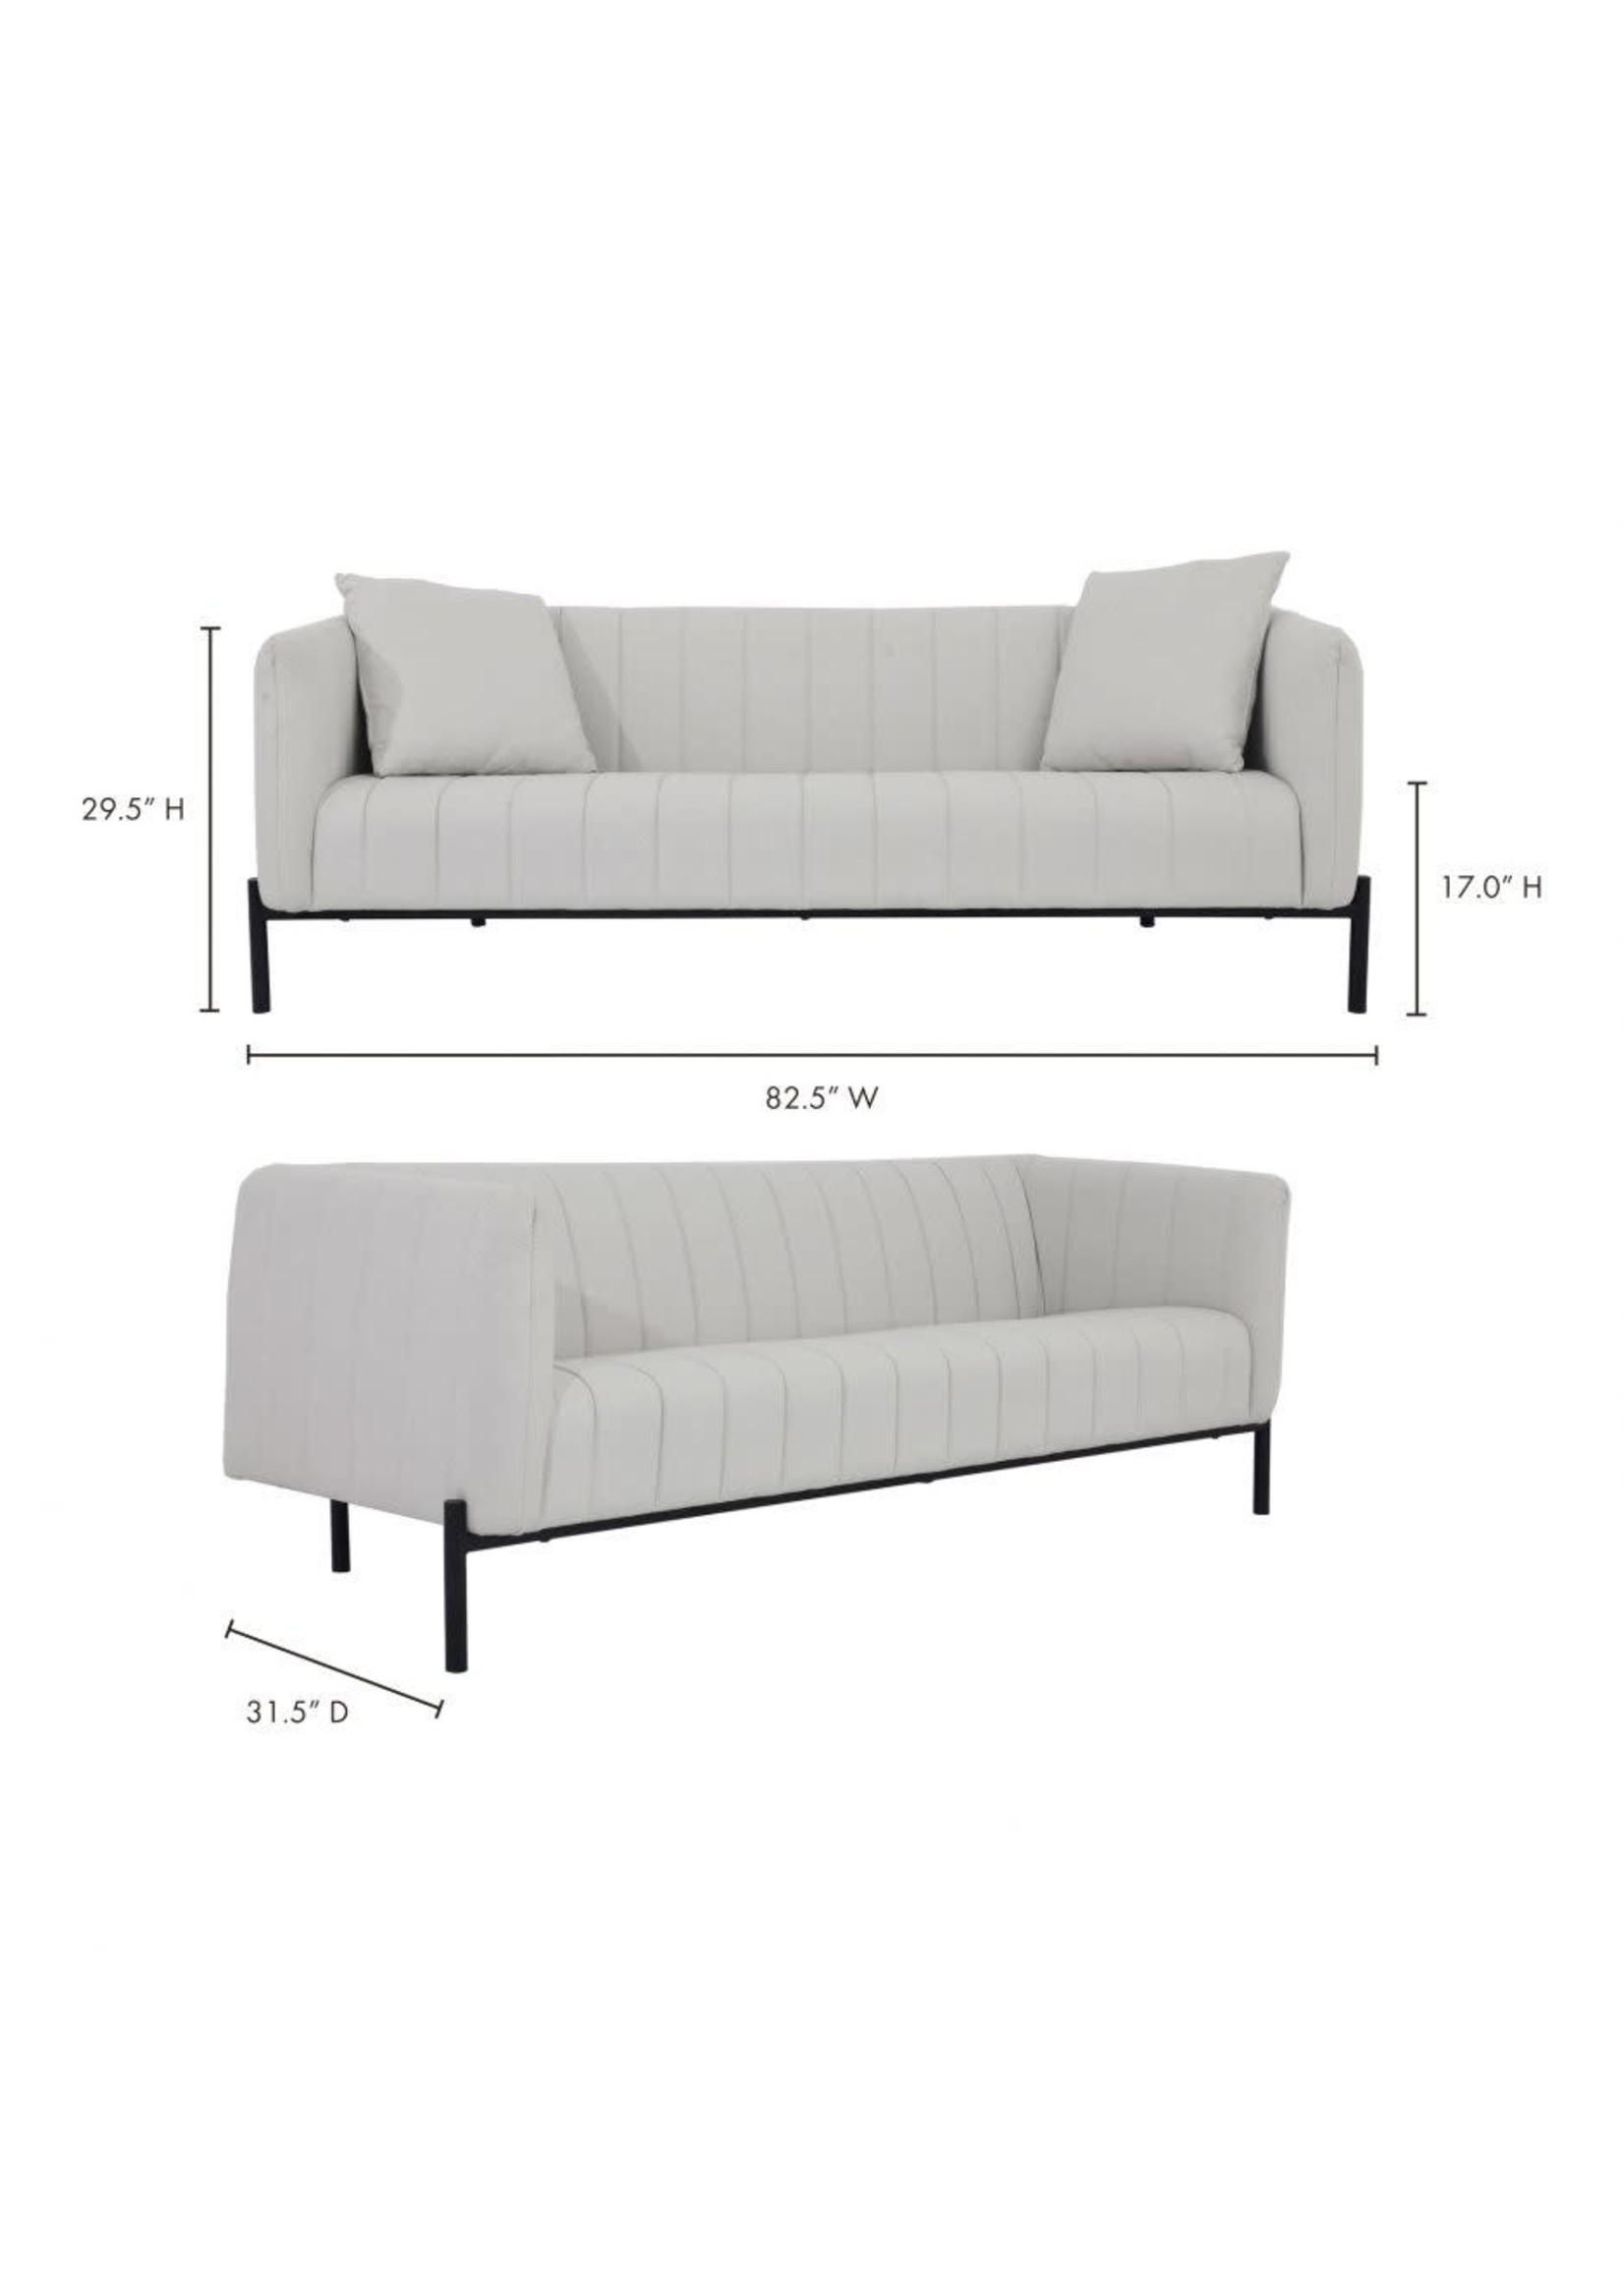 Moes Home Collection MOES Jaxon Sofa Light Grey